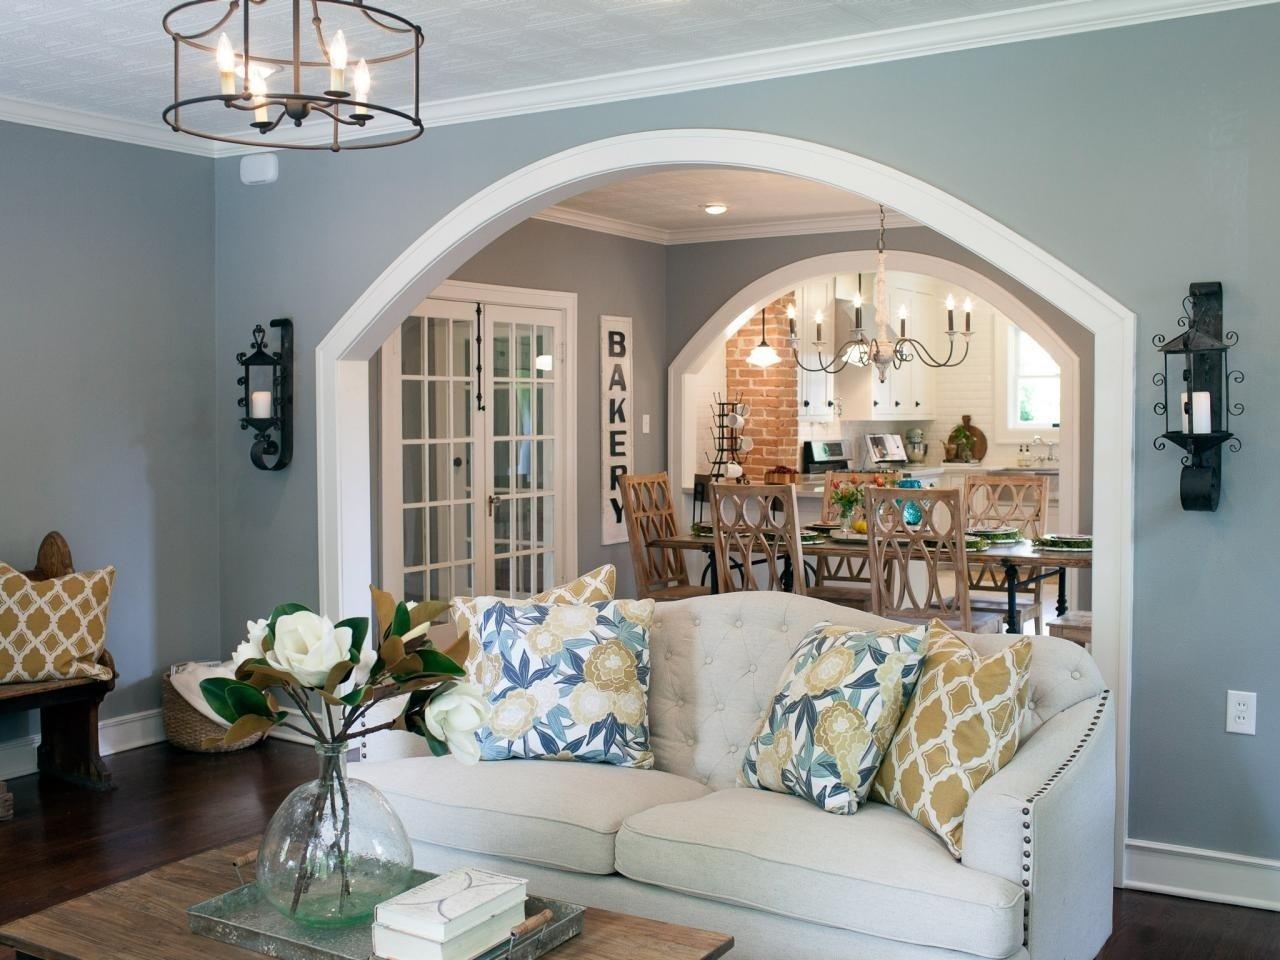 10 Stunning Living Room Paint Ideas Pinterest amazing of painting living room walls with ideas about paint on 2021